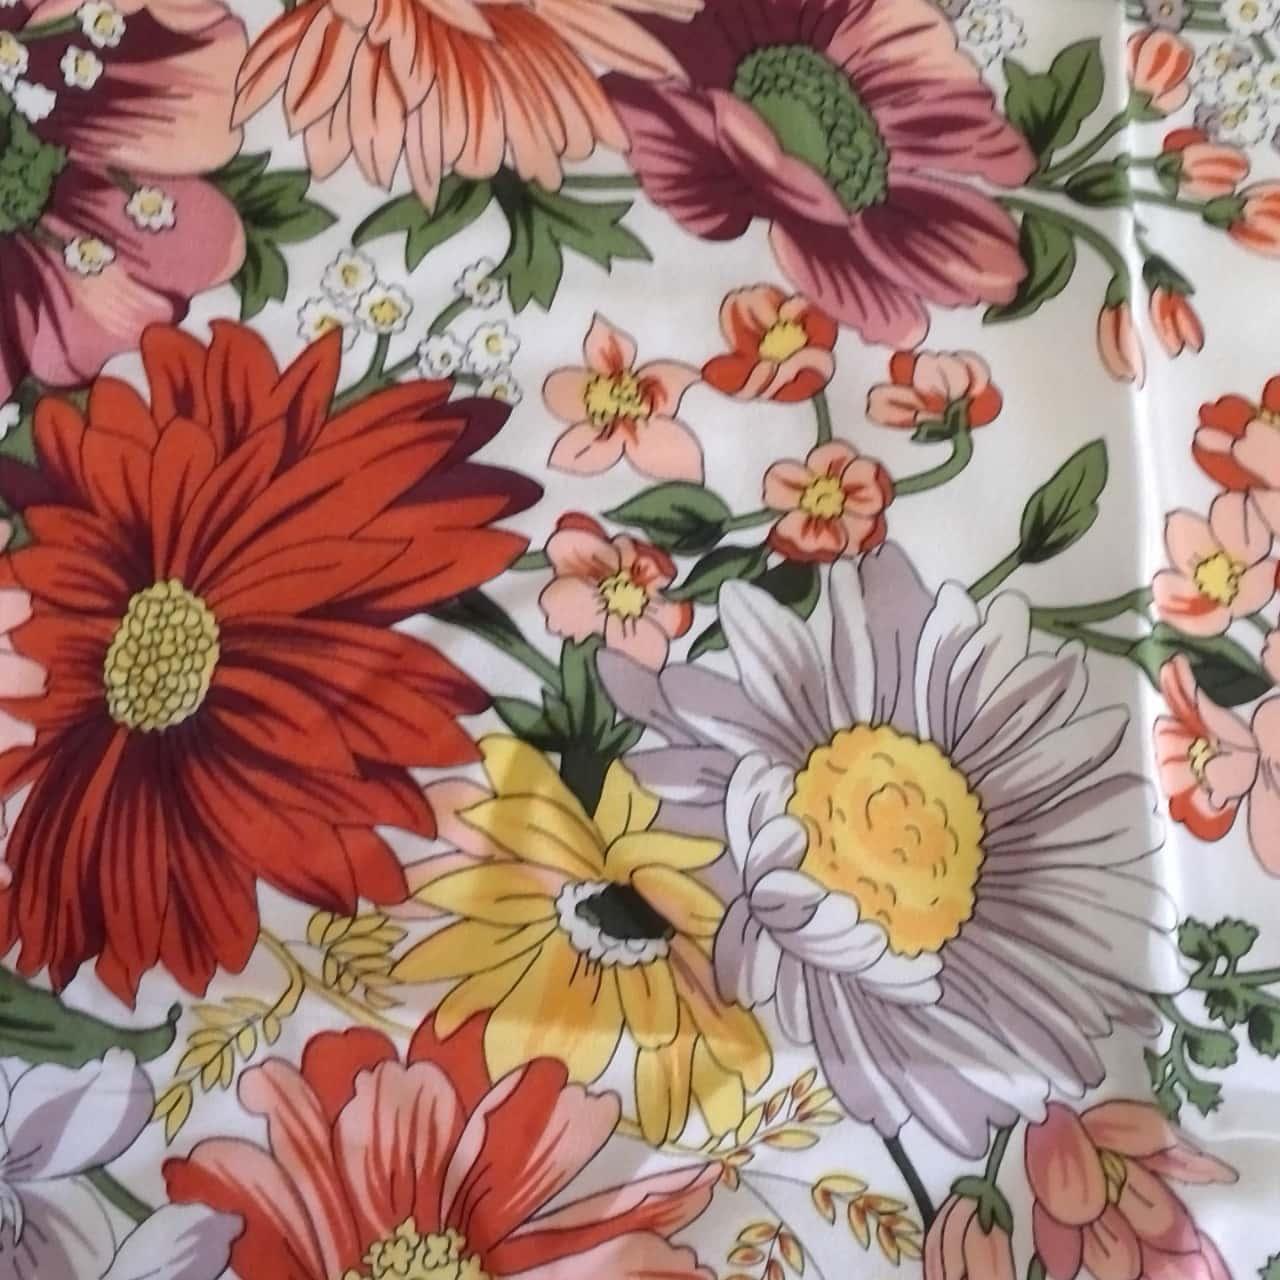 Womens LARGE VINTAGE SCARF Brown /Cream Floral 104 cm x 111 cm